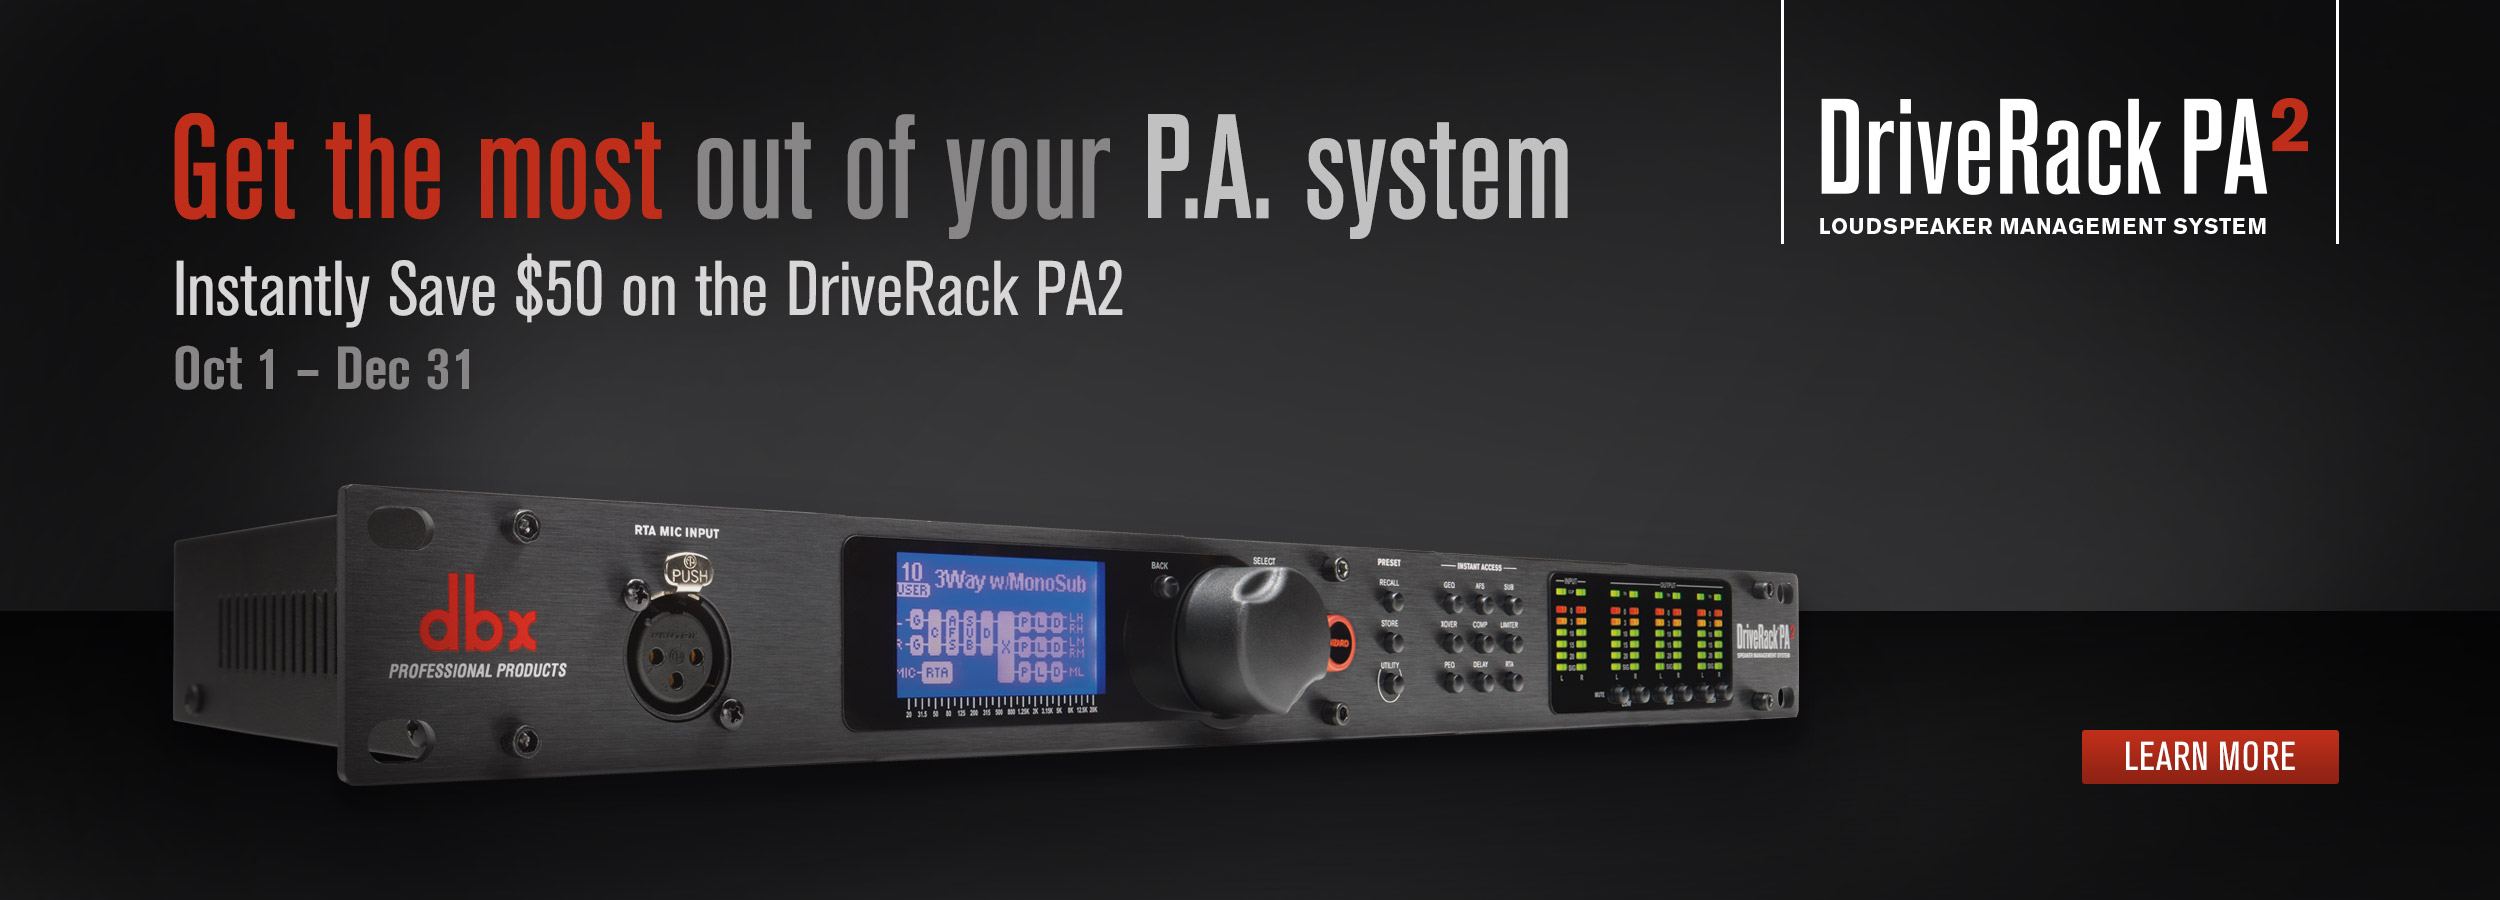 dbx DriveRackPA2 $50 Instant Rebate Promotion - Oct-Dec 2016